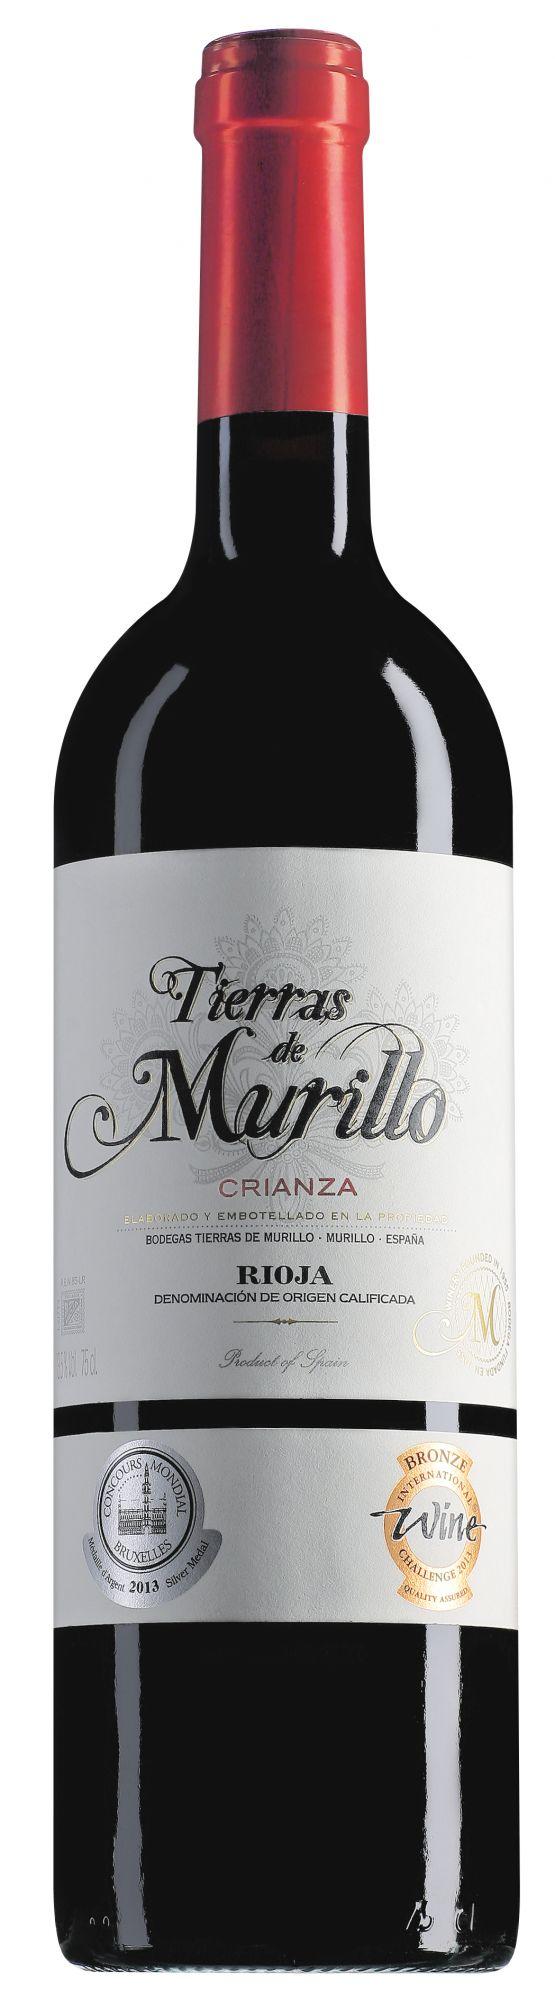 Tierras de Murillo Rioja Crianza